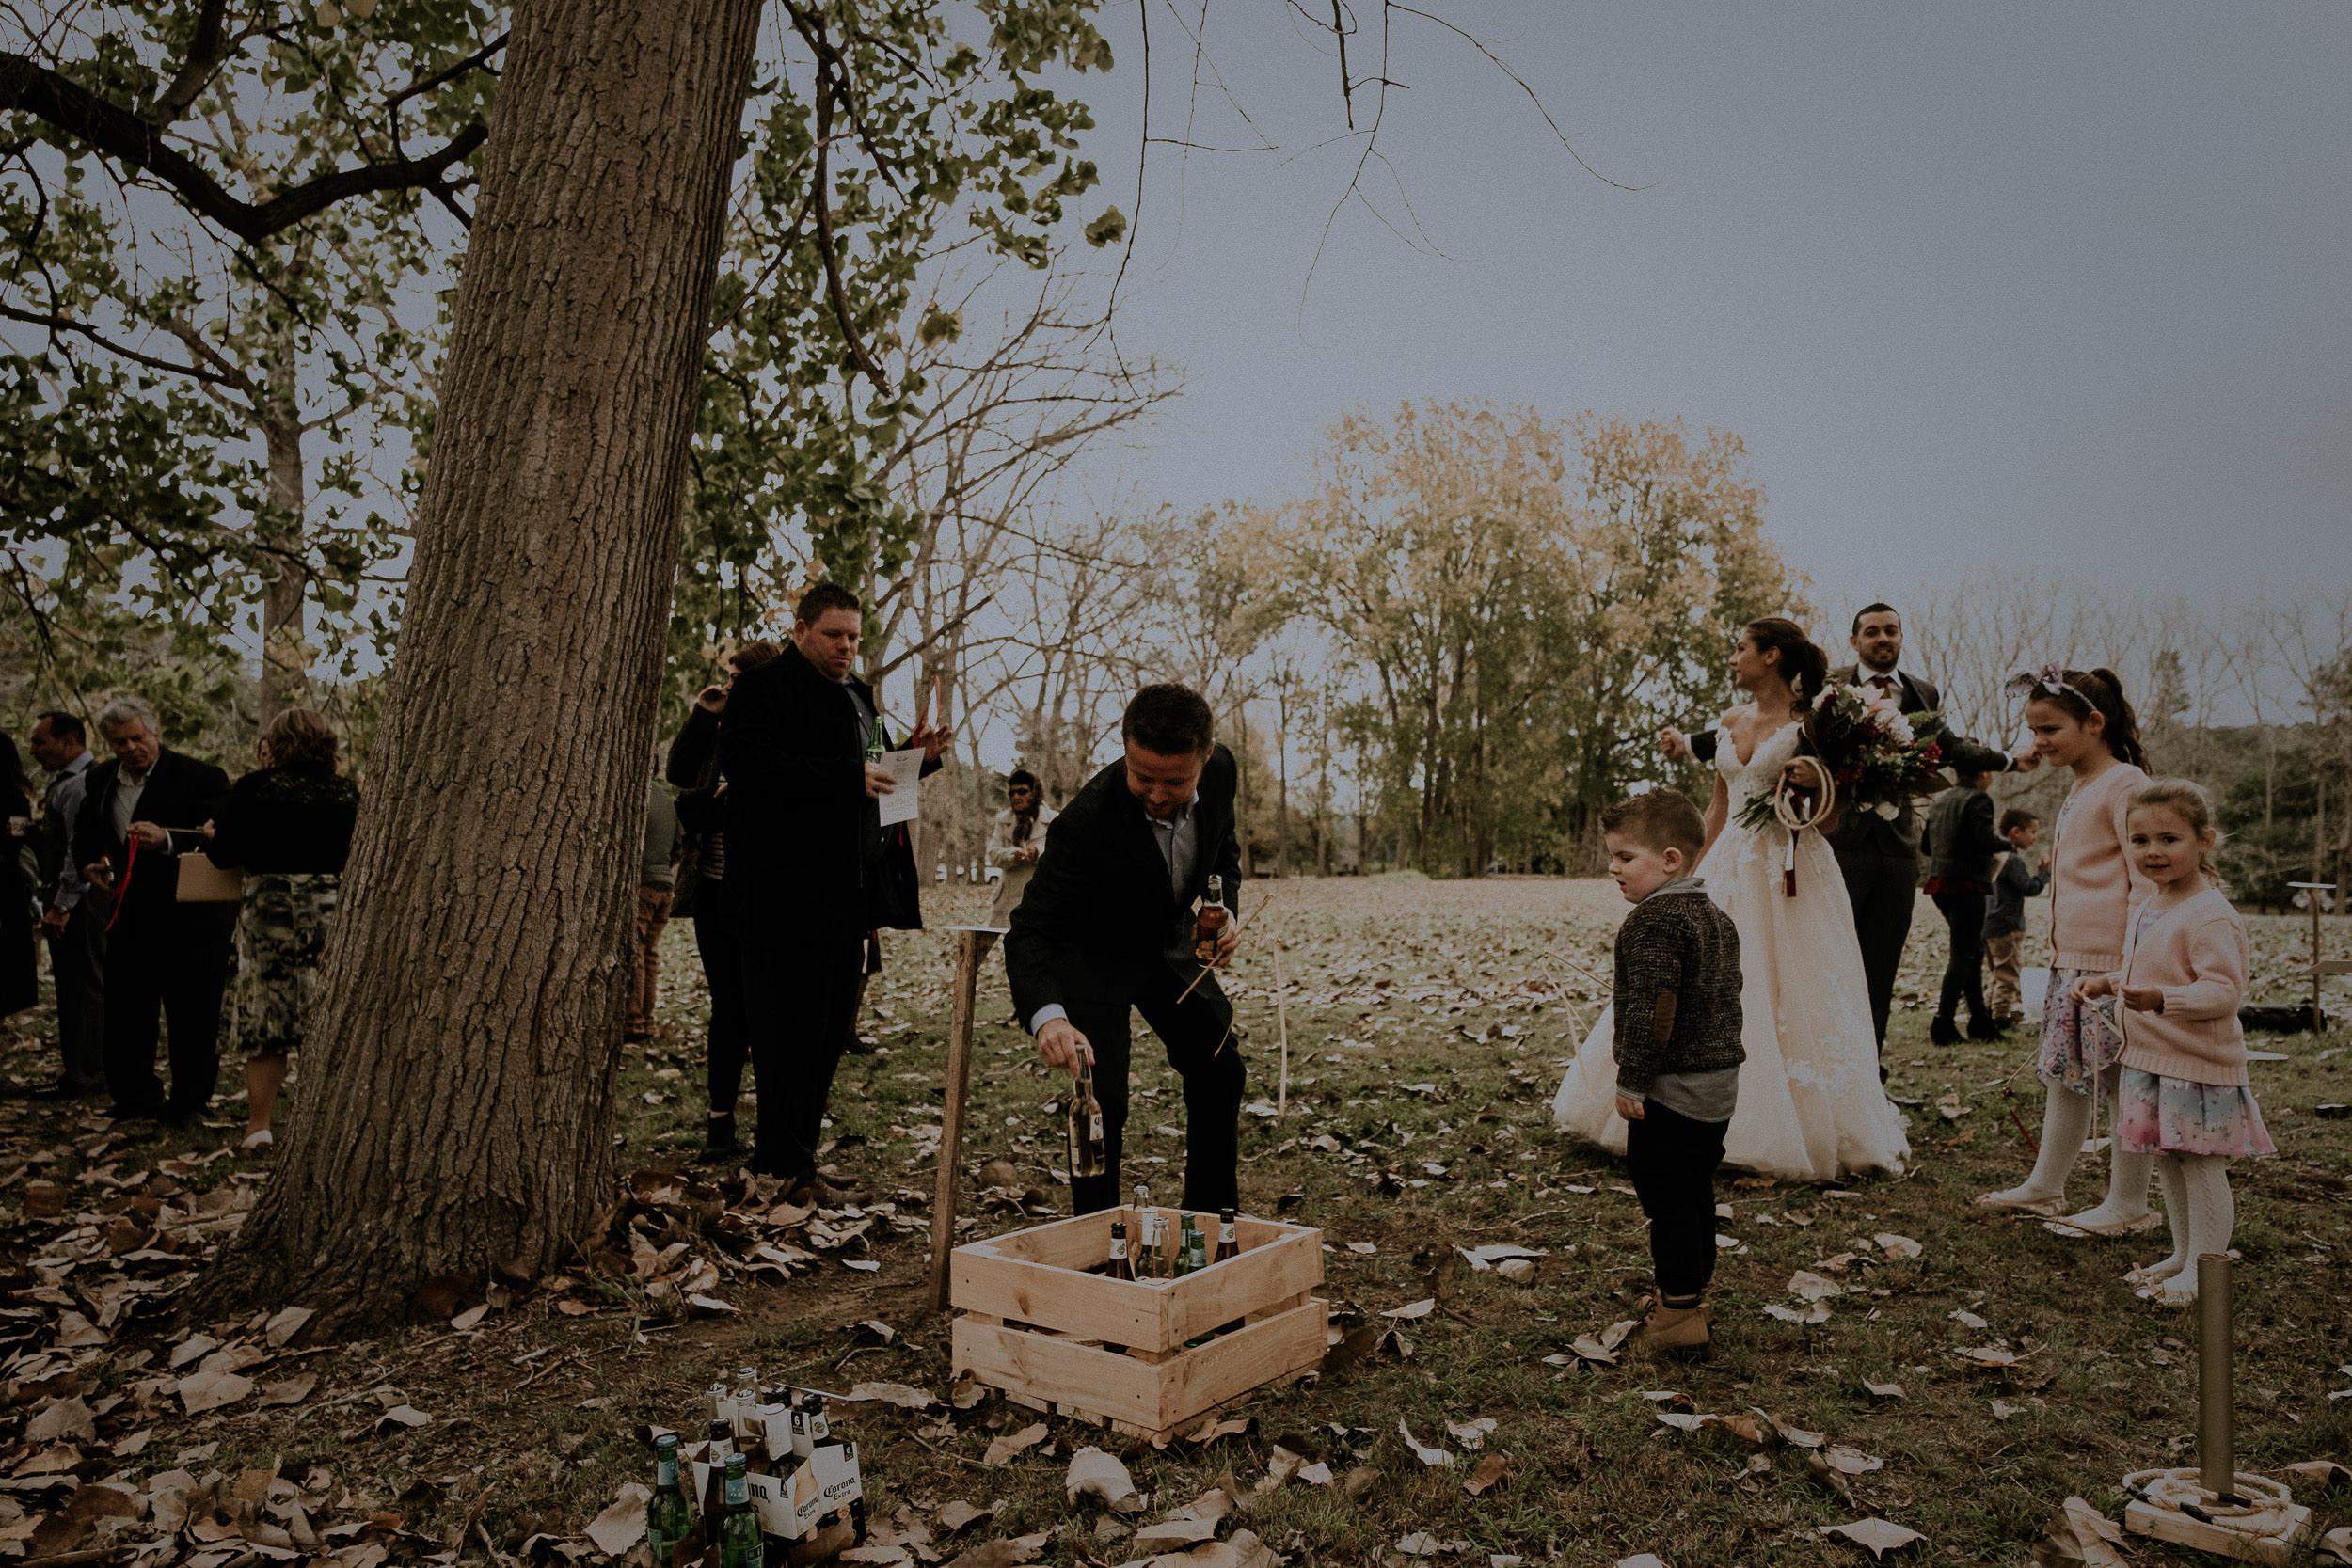 g_c wedding - kings _ thieves elopement wedding photography - blog 62.jpg